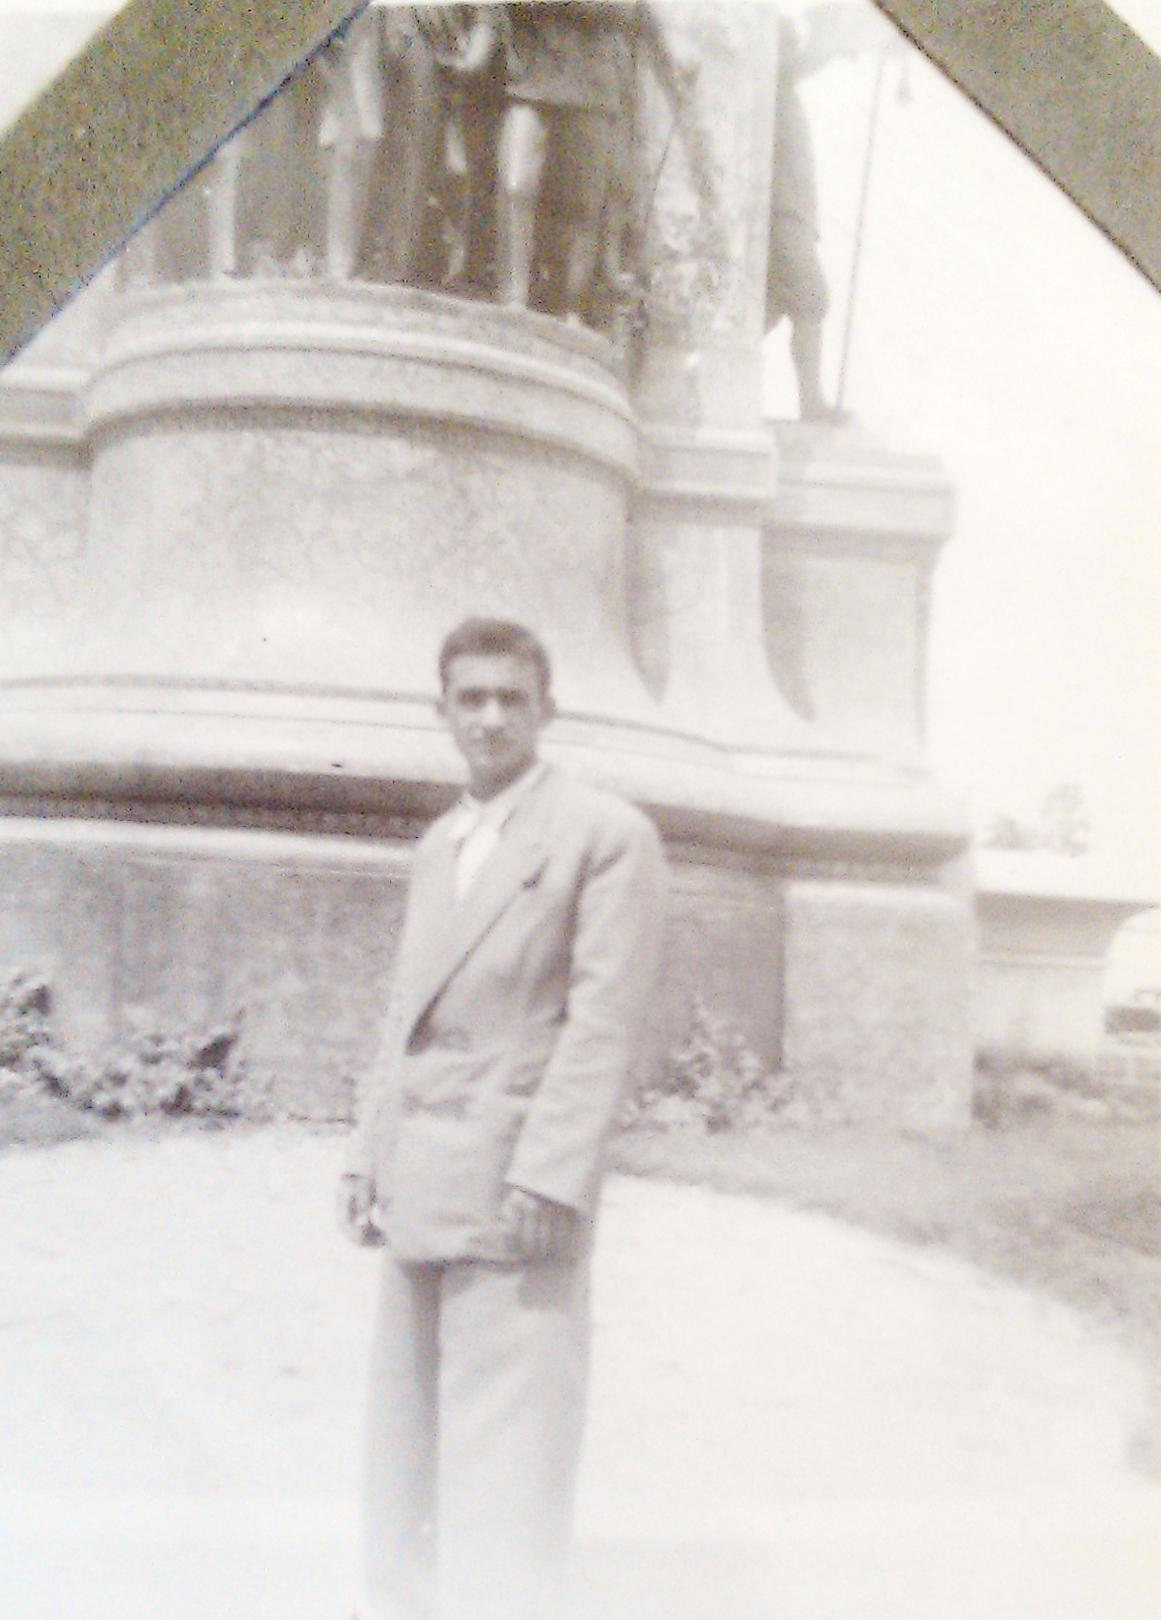 a.-gülağ-taksim-aniti-önünde-1947.jpg